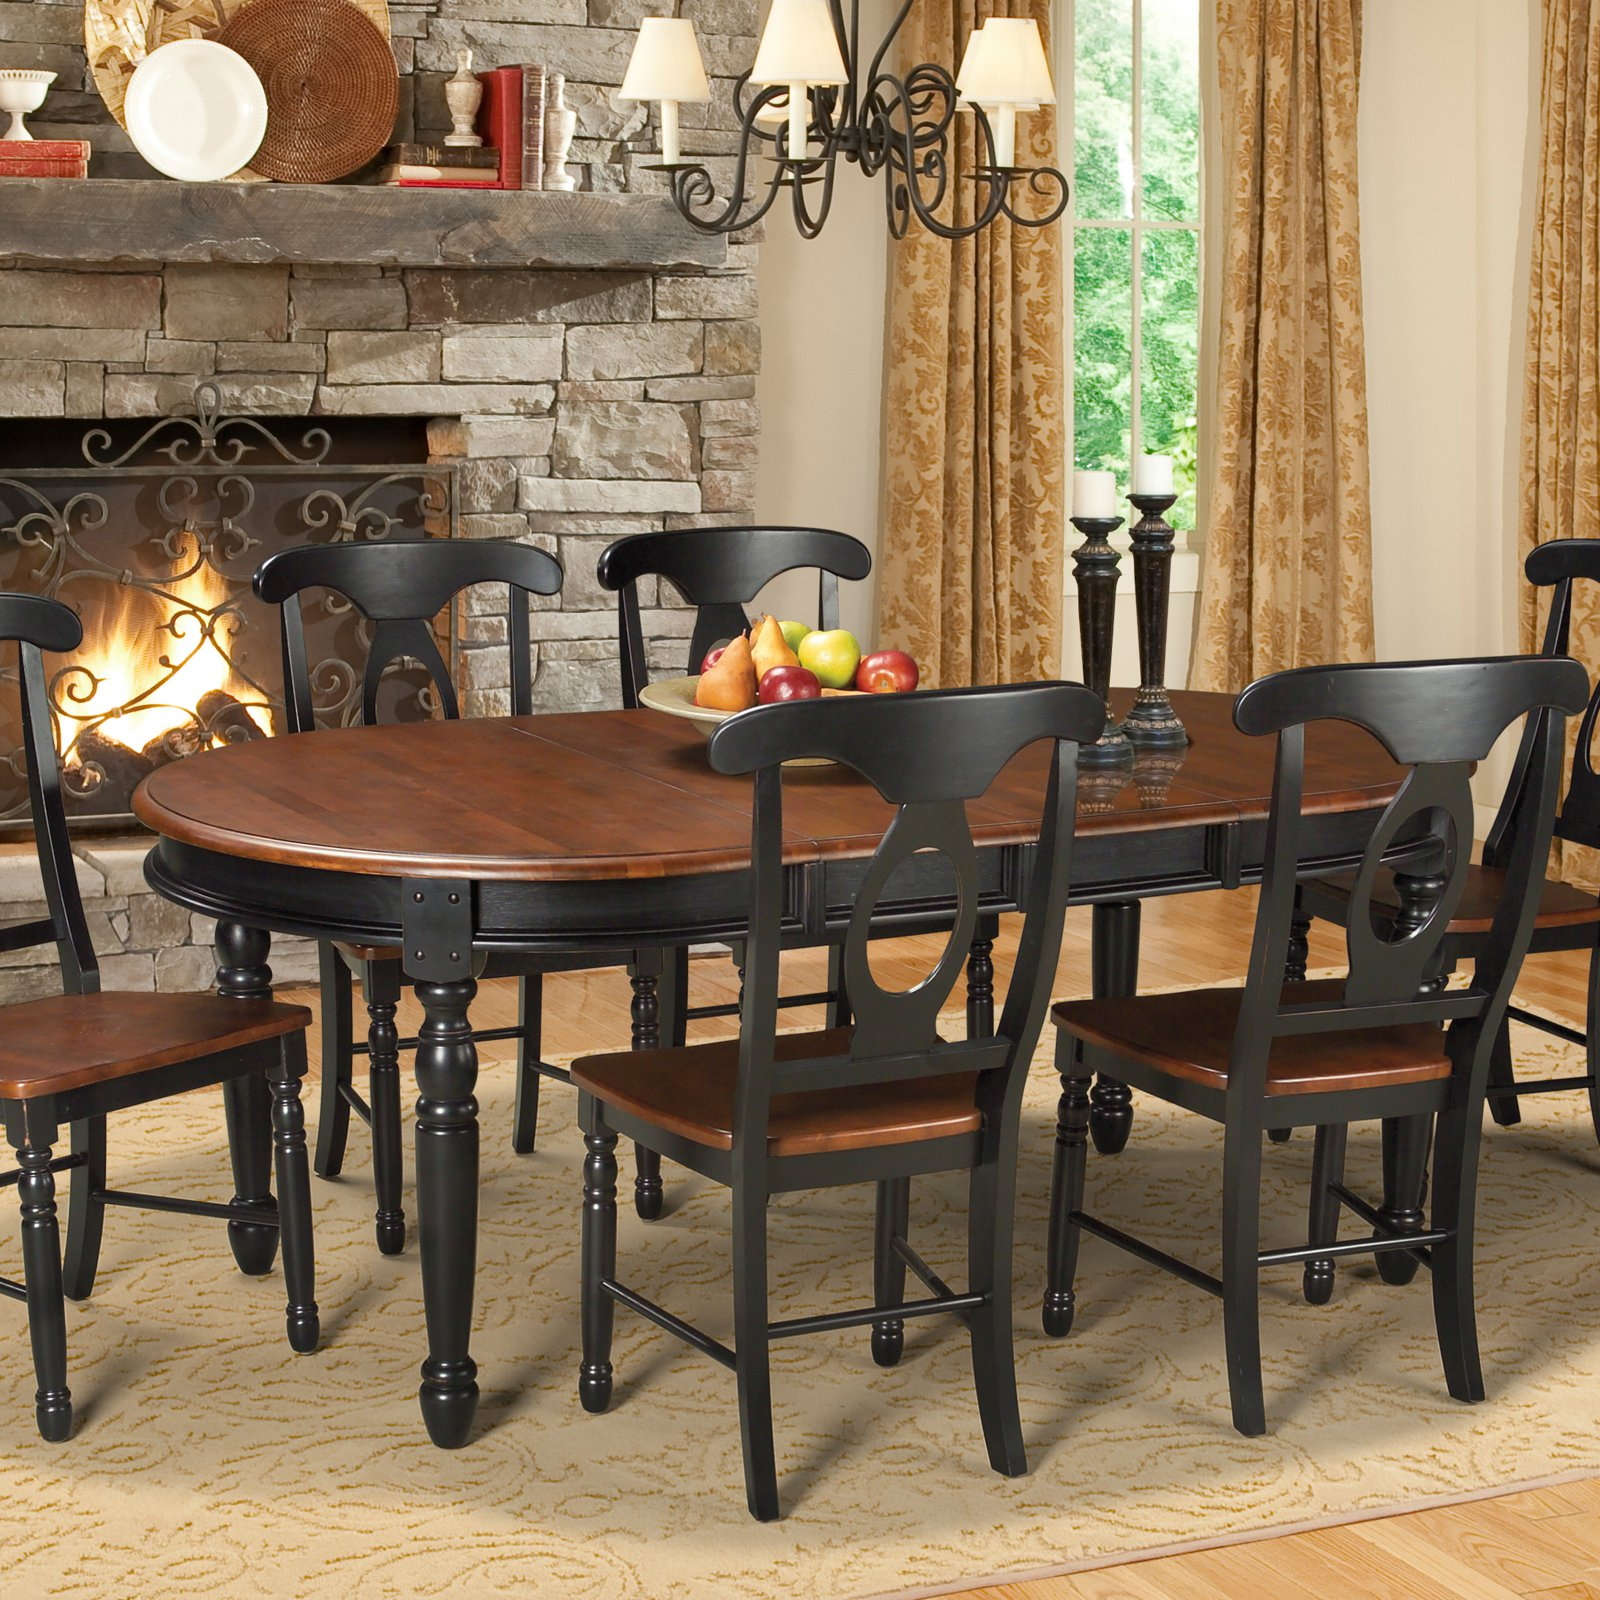 AAmerica British Isles Oval Dining Table Walmartcom